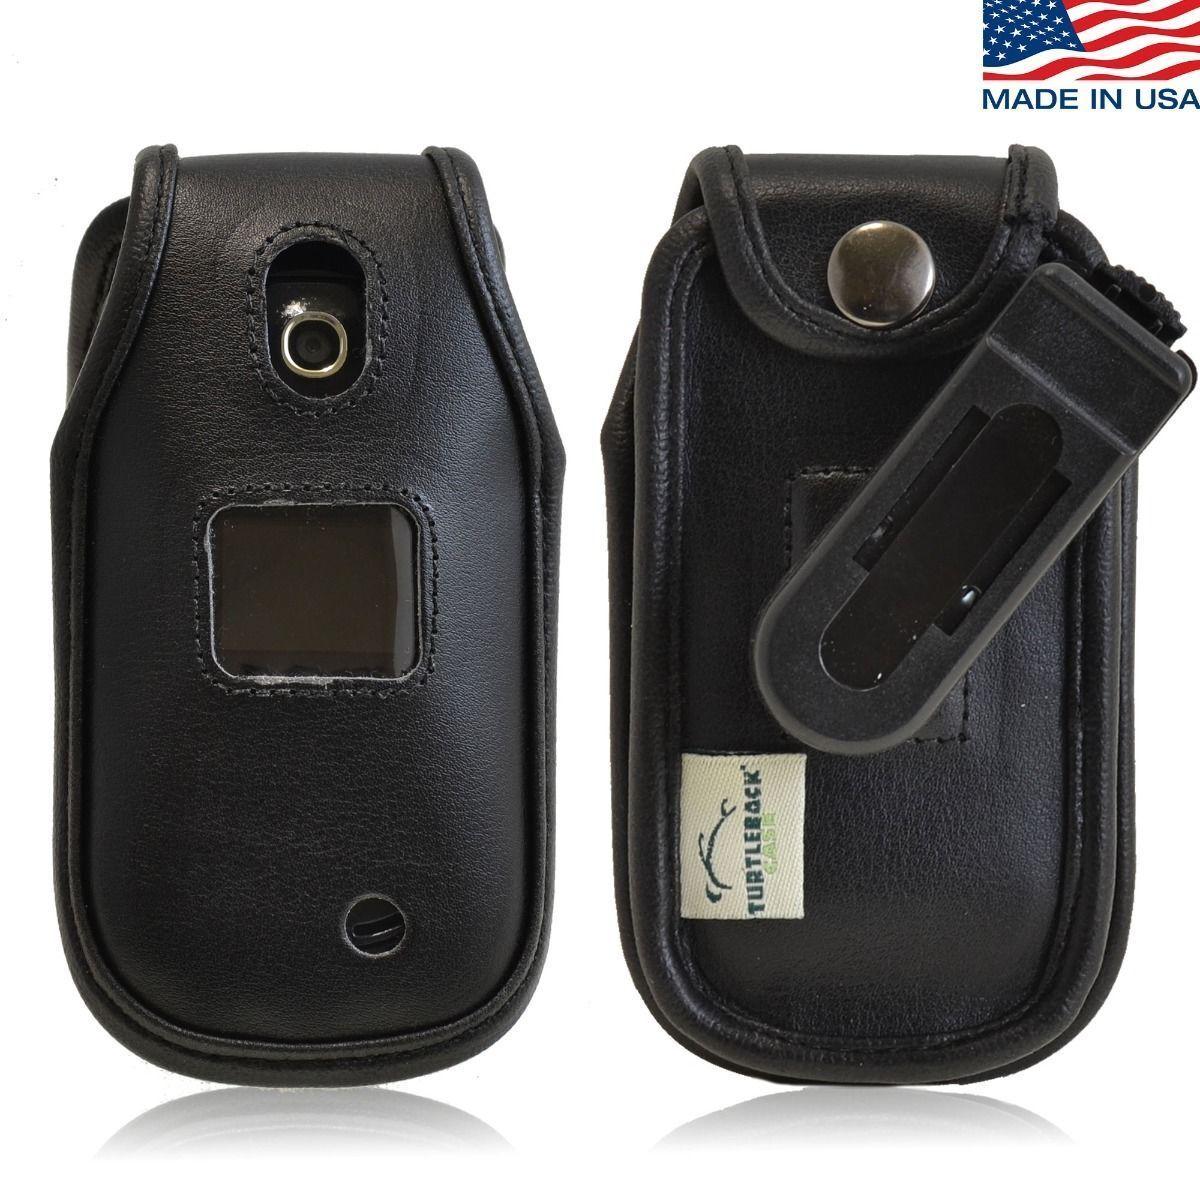 turtleback-premium-leather-fitted-case-rotating-belt-clip-for-lg-revere-3-vn170